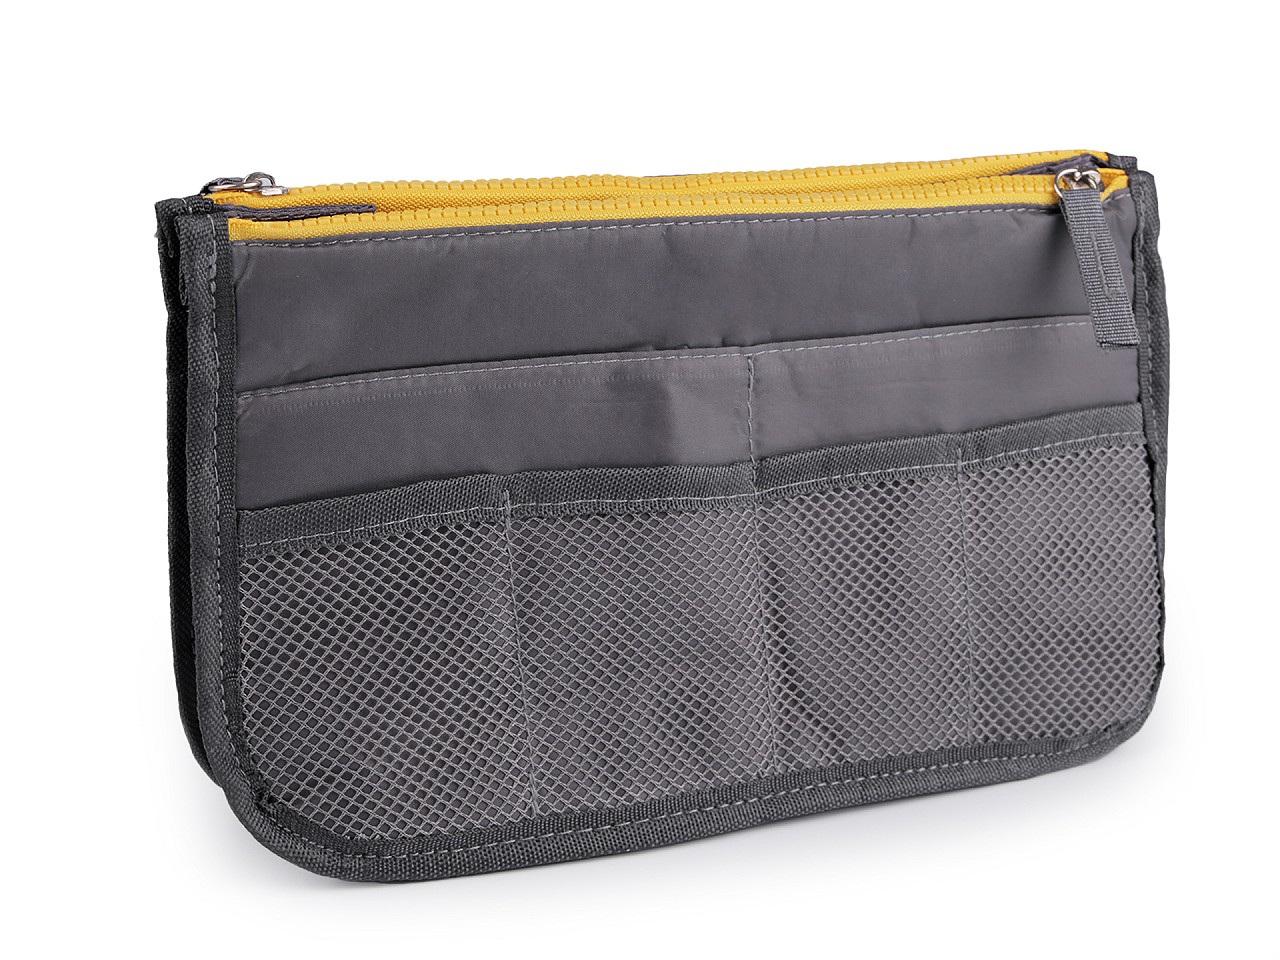 Organizér do kabelky 16x27 cm, barva 6 šedá